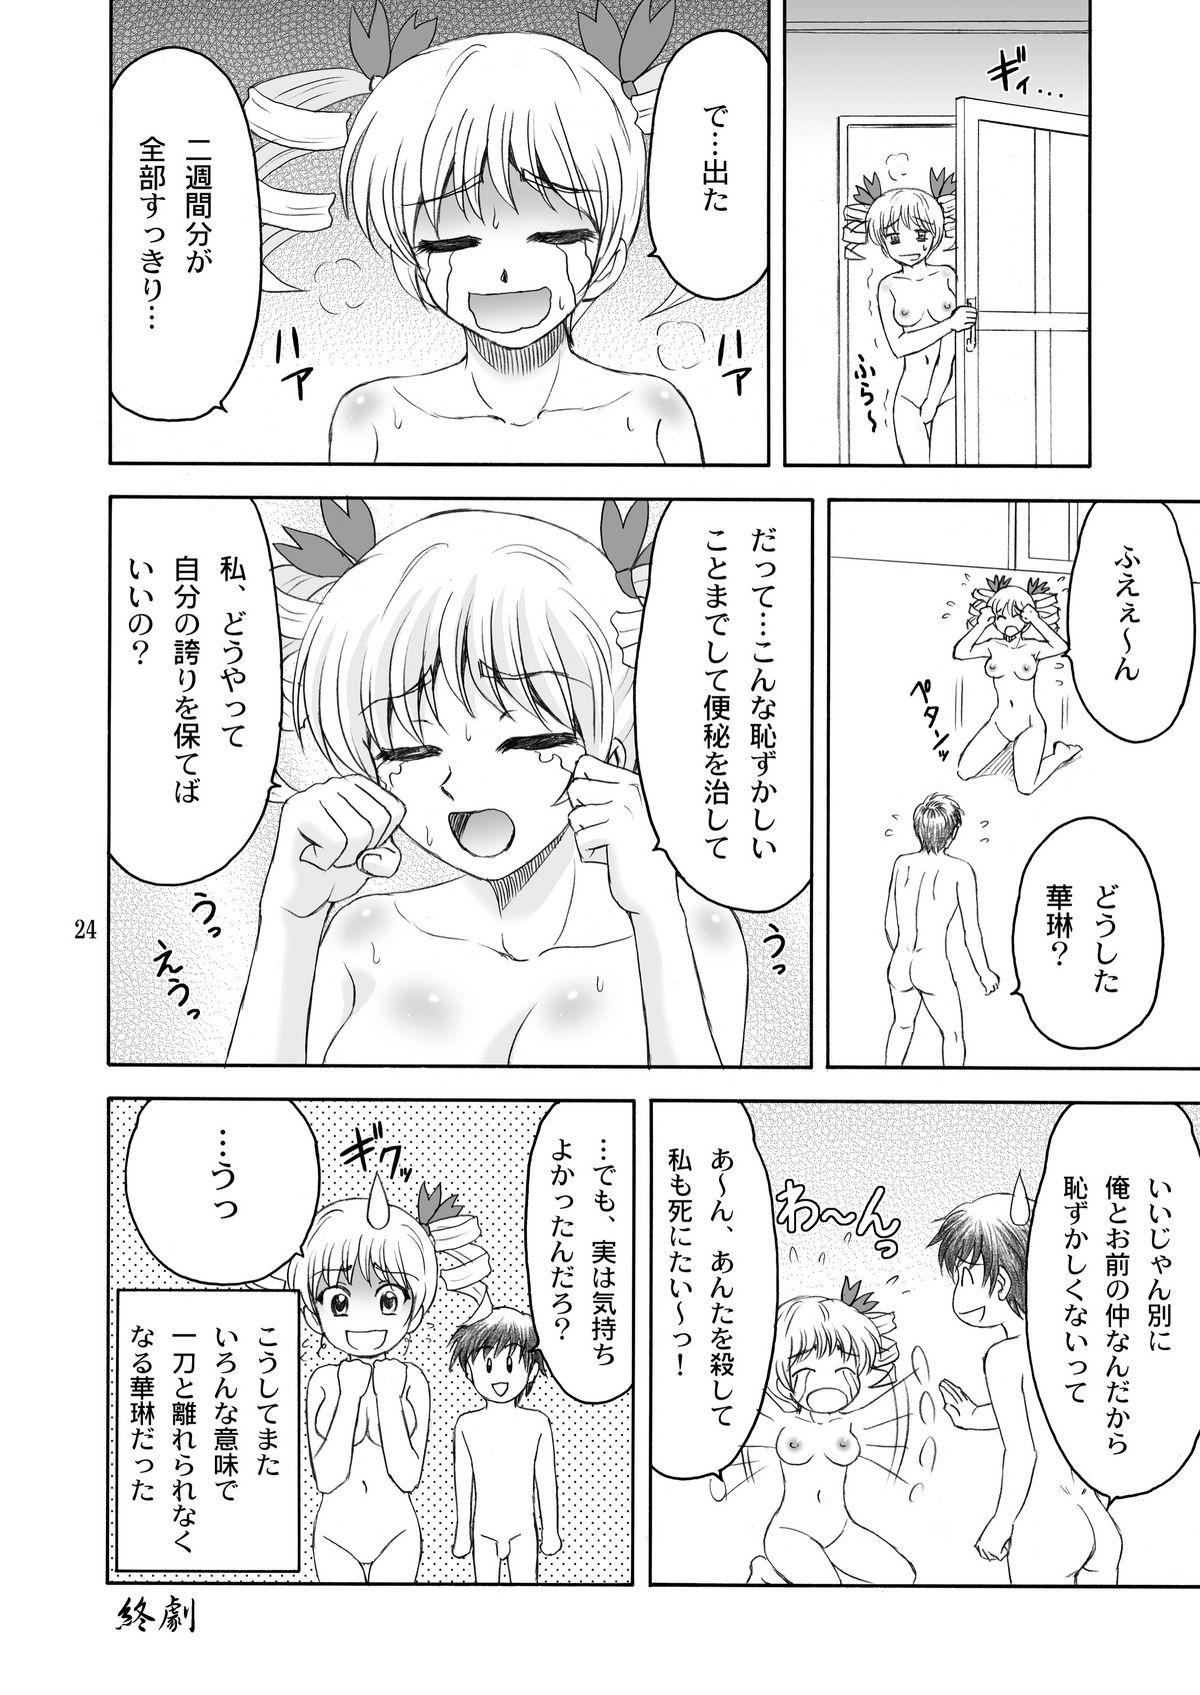 Karin-sama Otsuujiteki Jijou 23